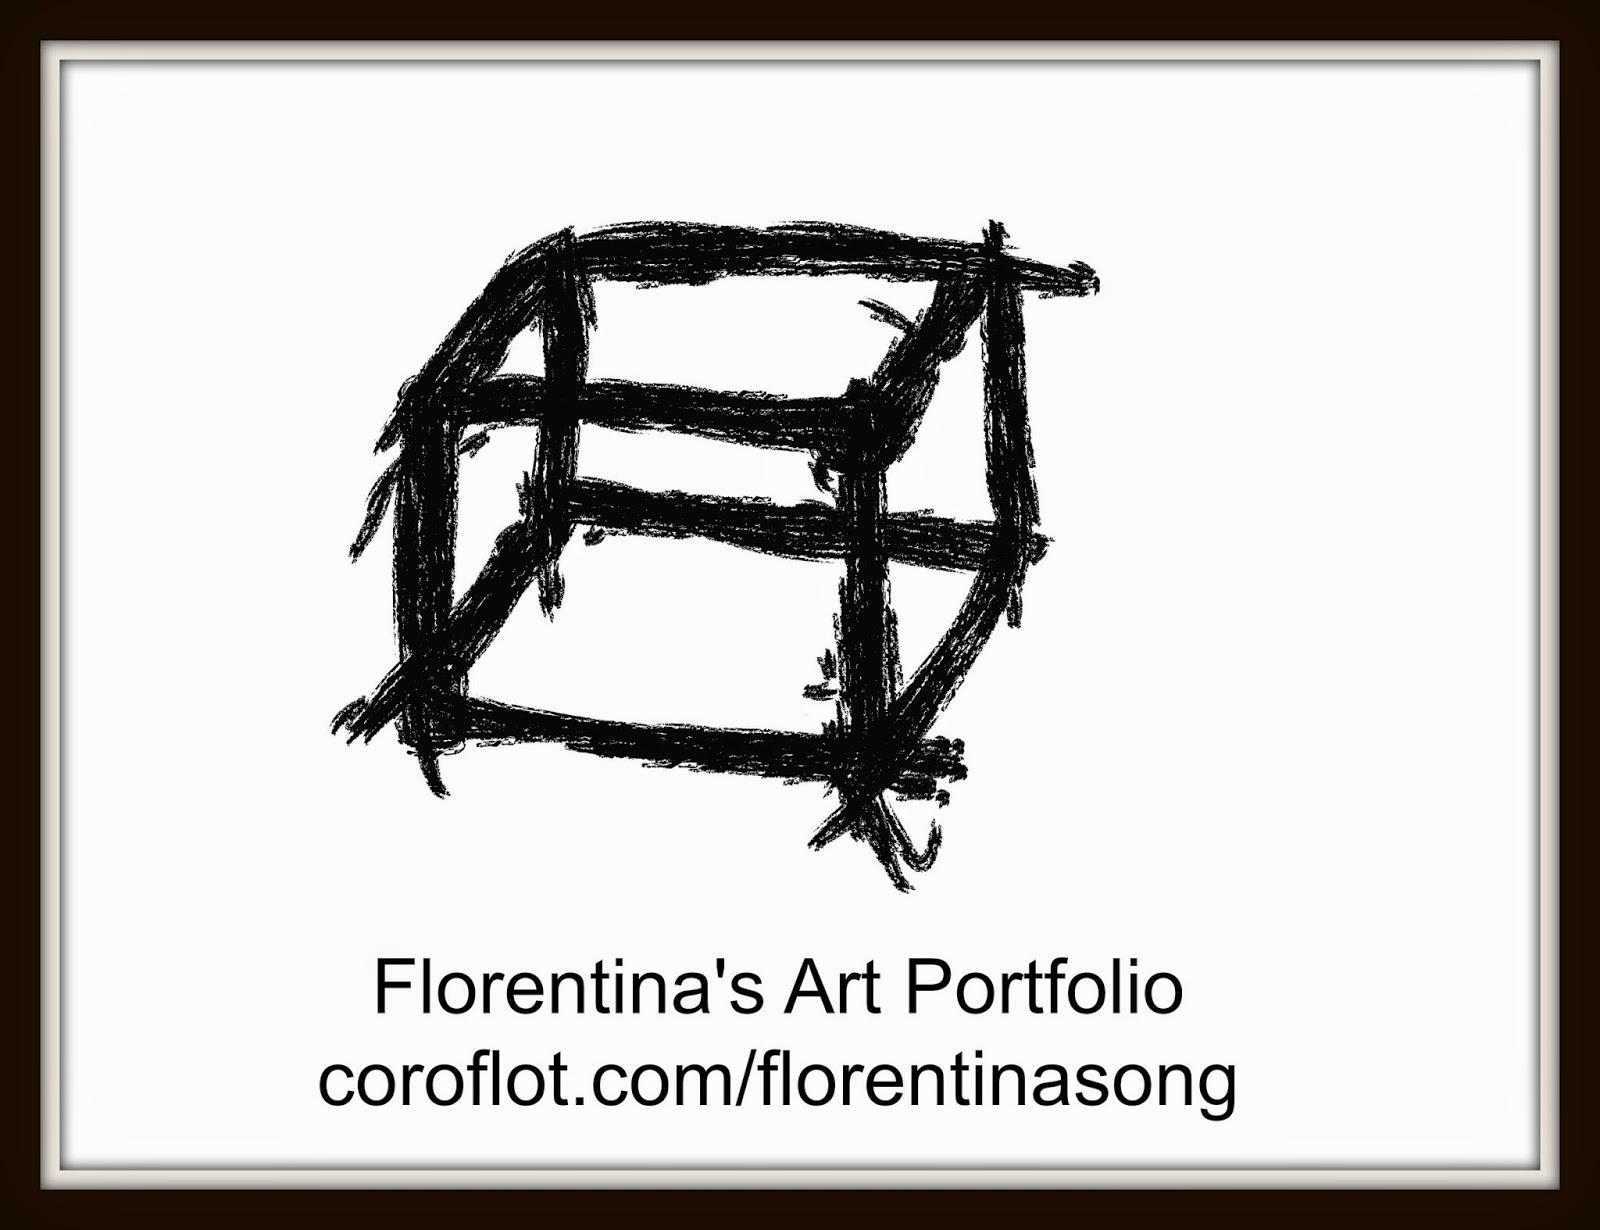 http://www.coroflot.com/florentinasong